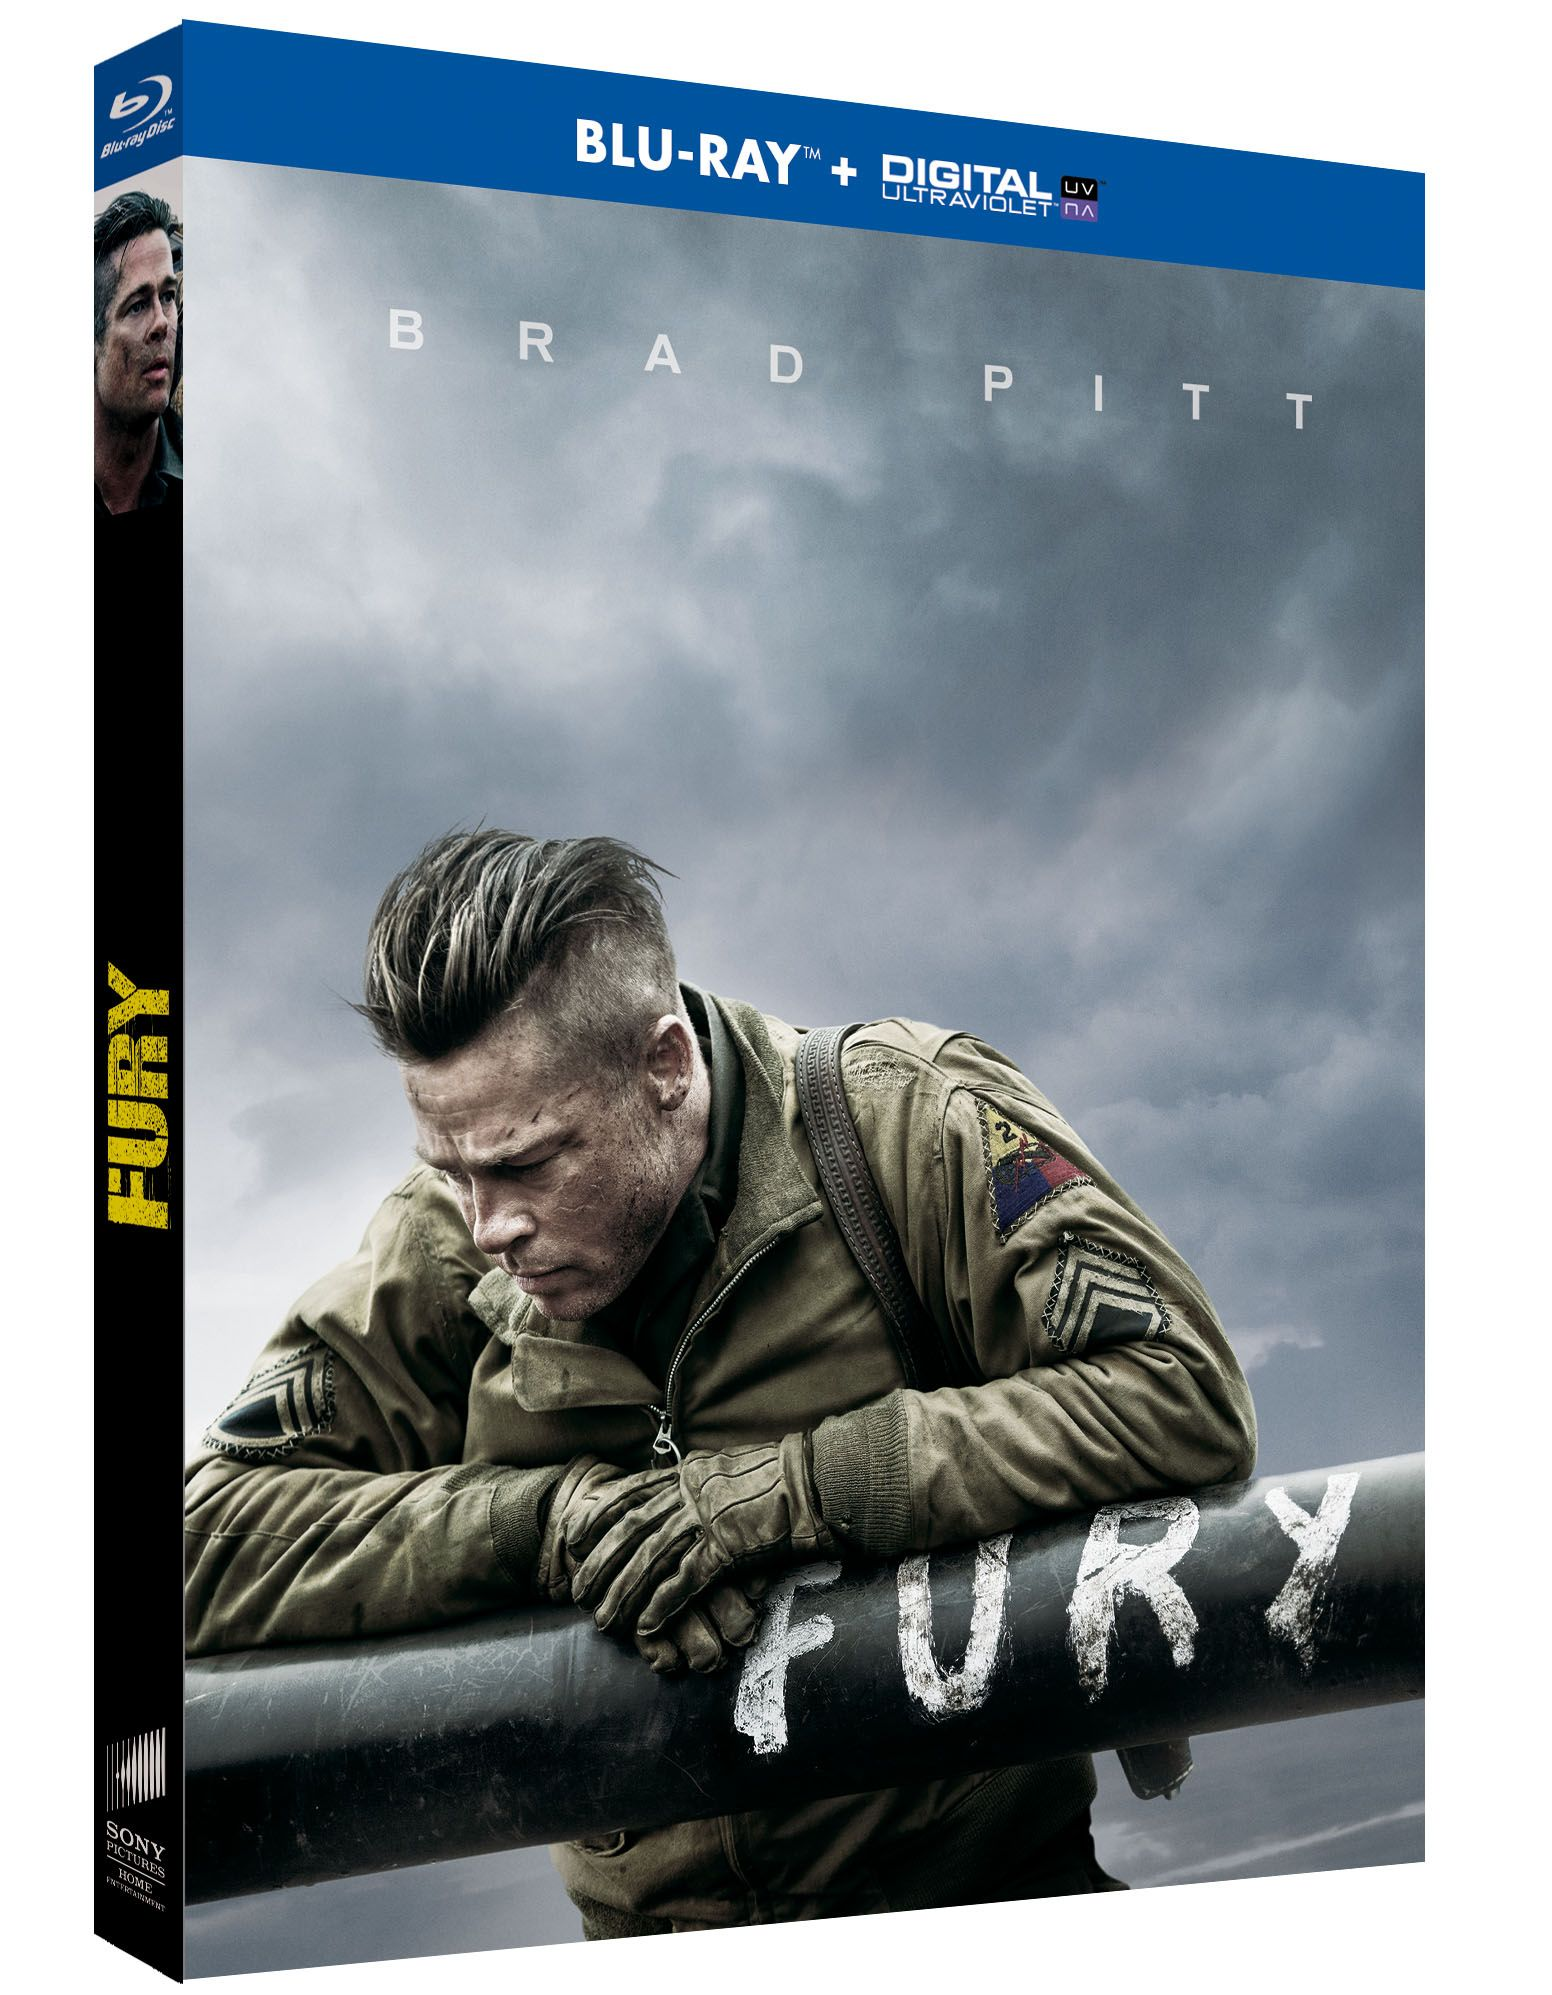 Concours Fury, 3 Bluray à gagner Affiche film, Film